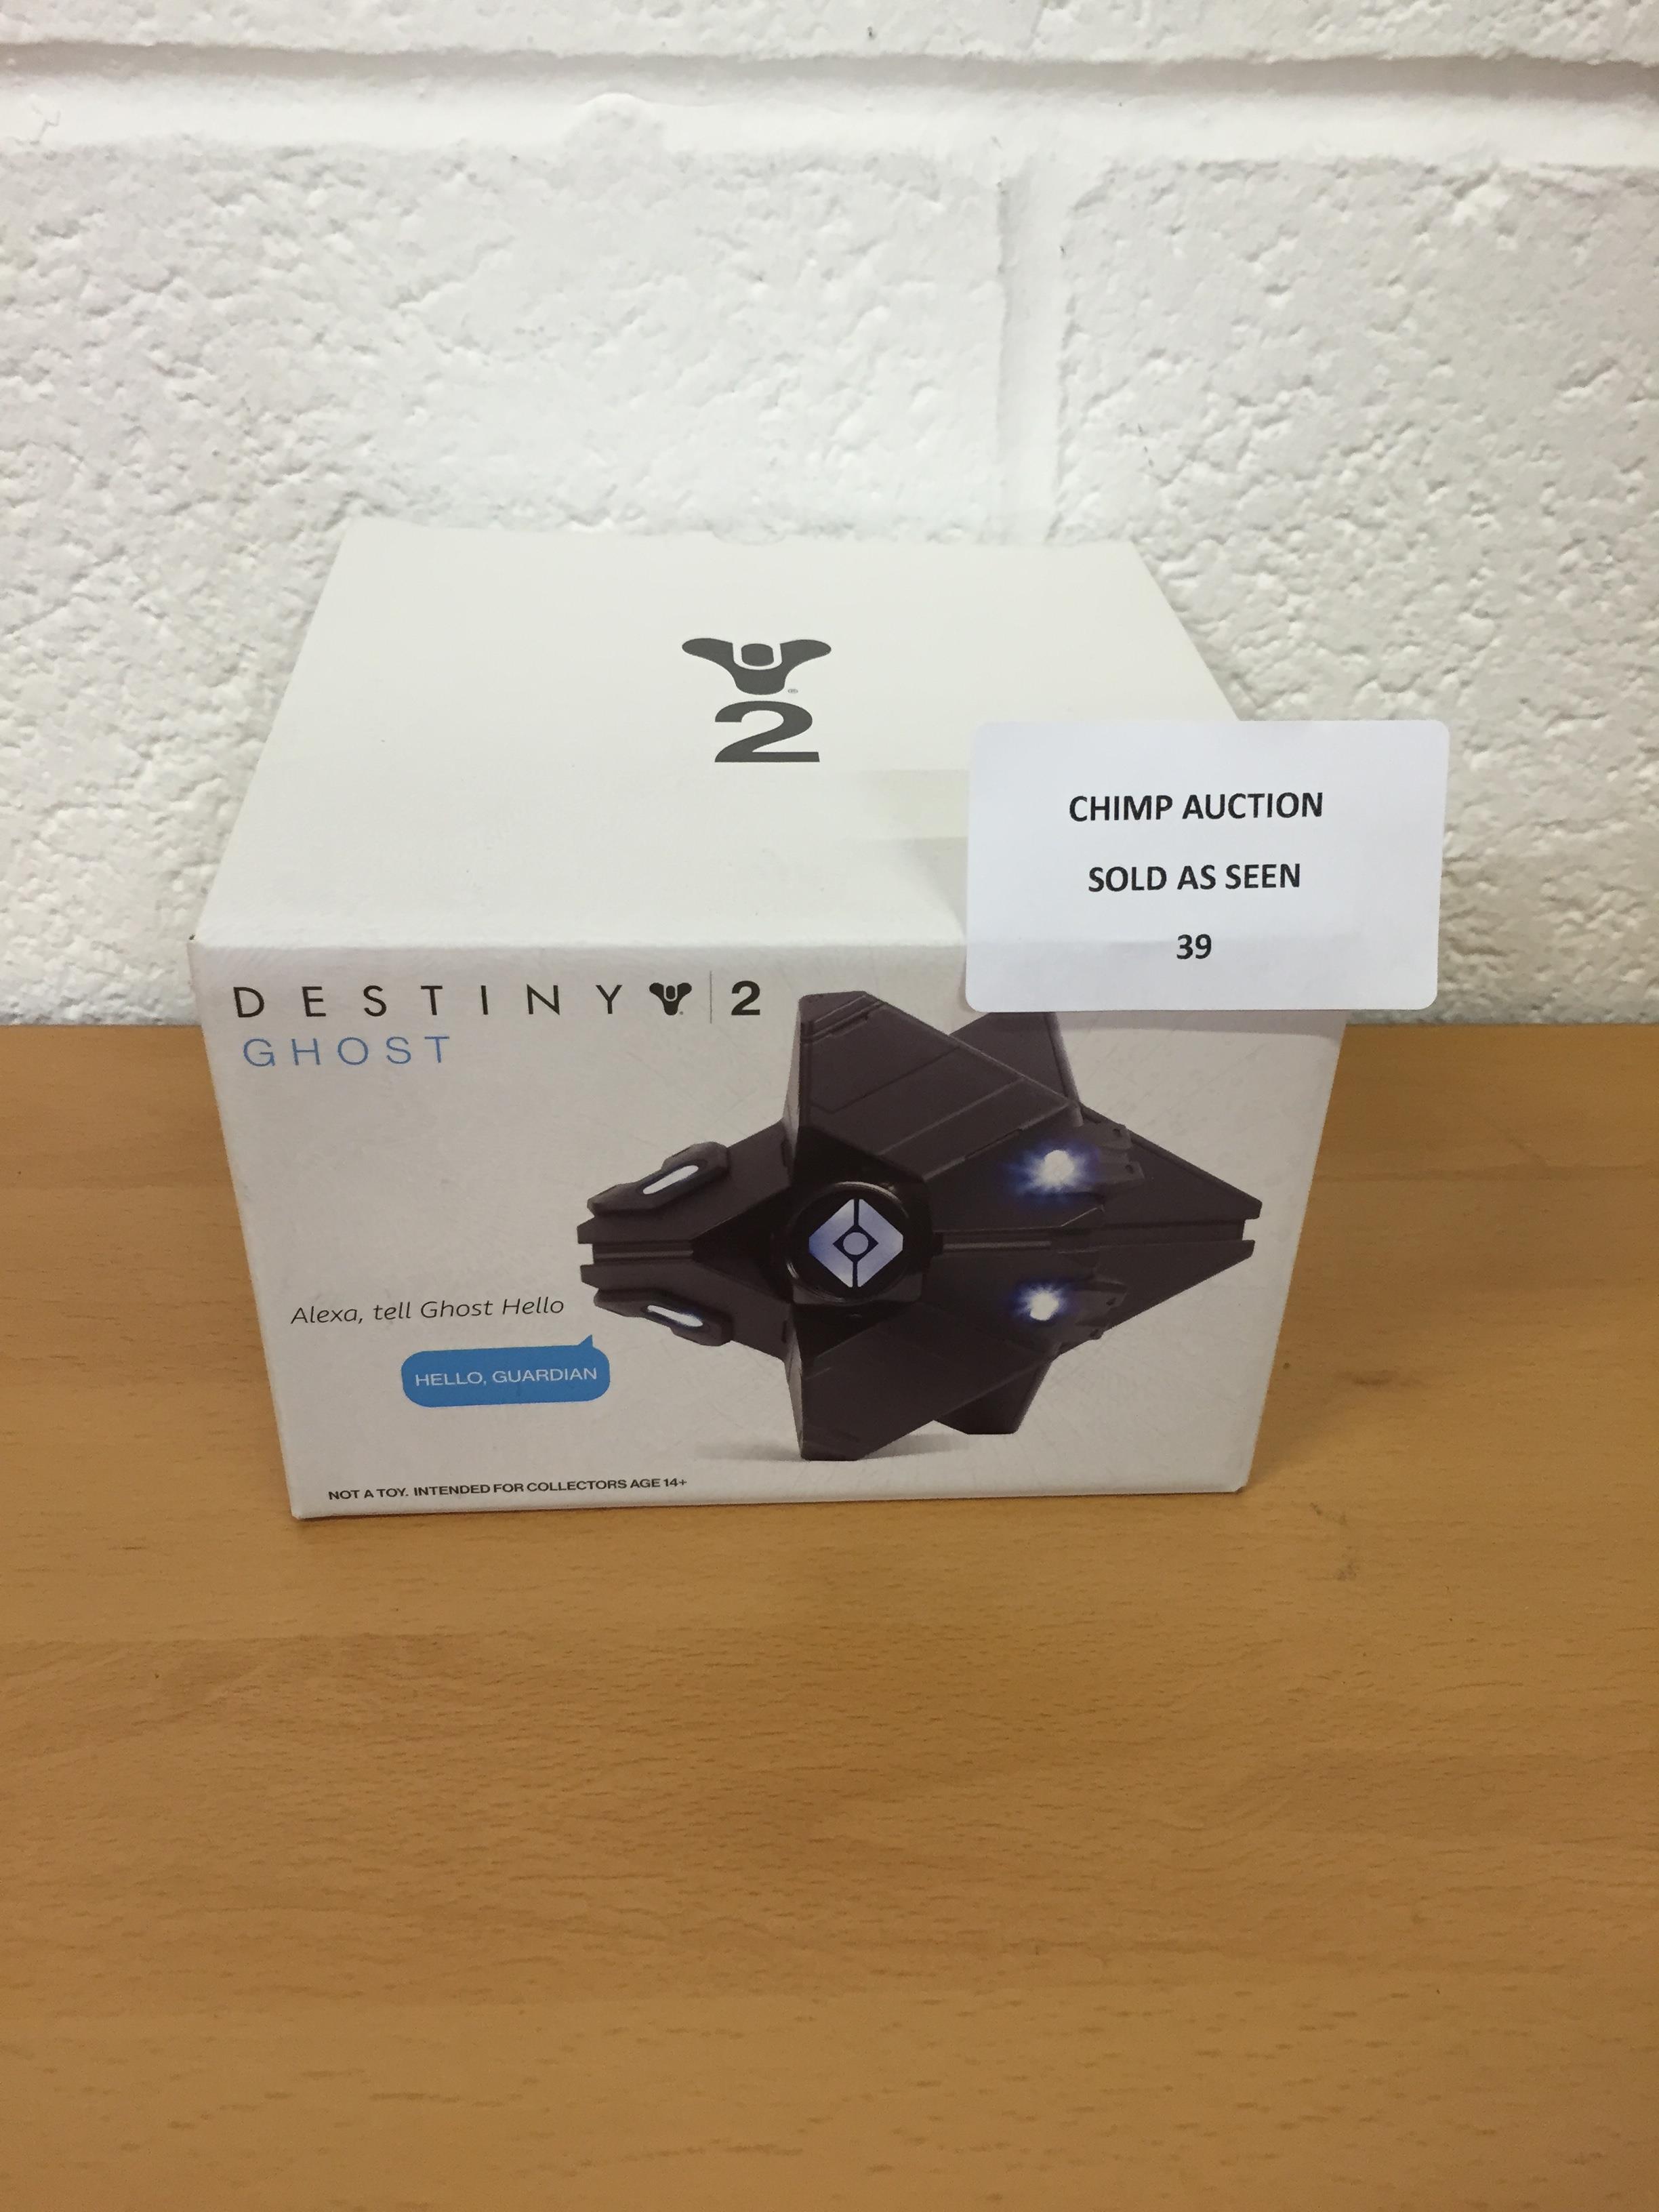 Lot 39 - Destiny 2 Ghost edition Alexa compatible RRP £79.99.